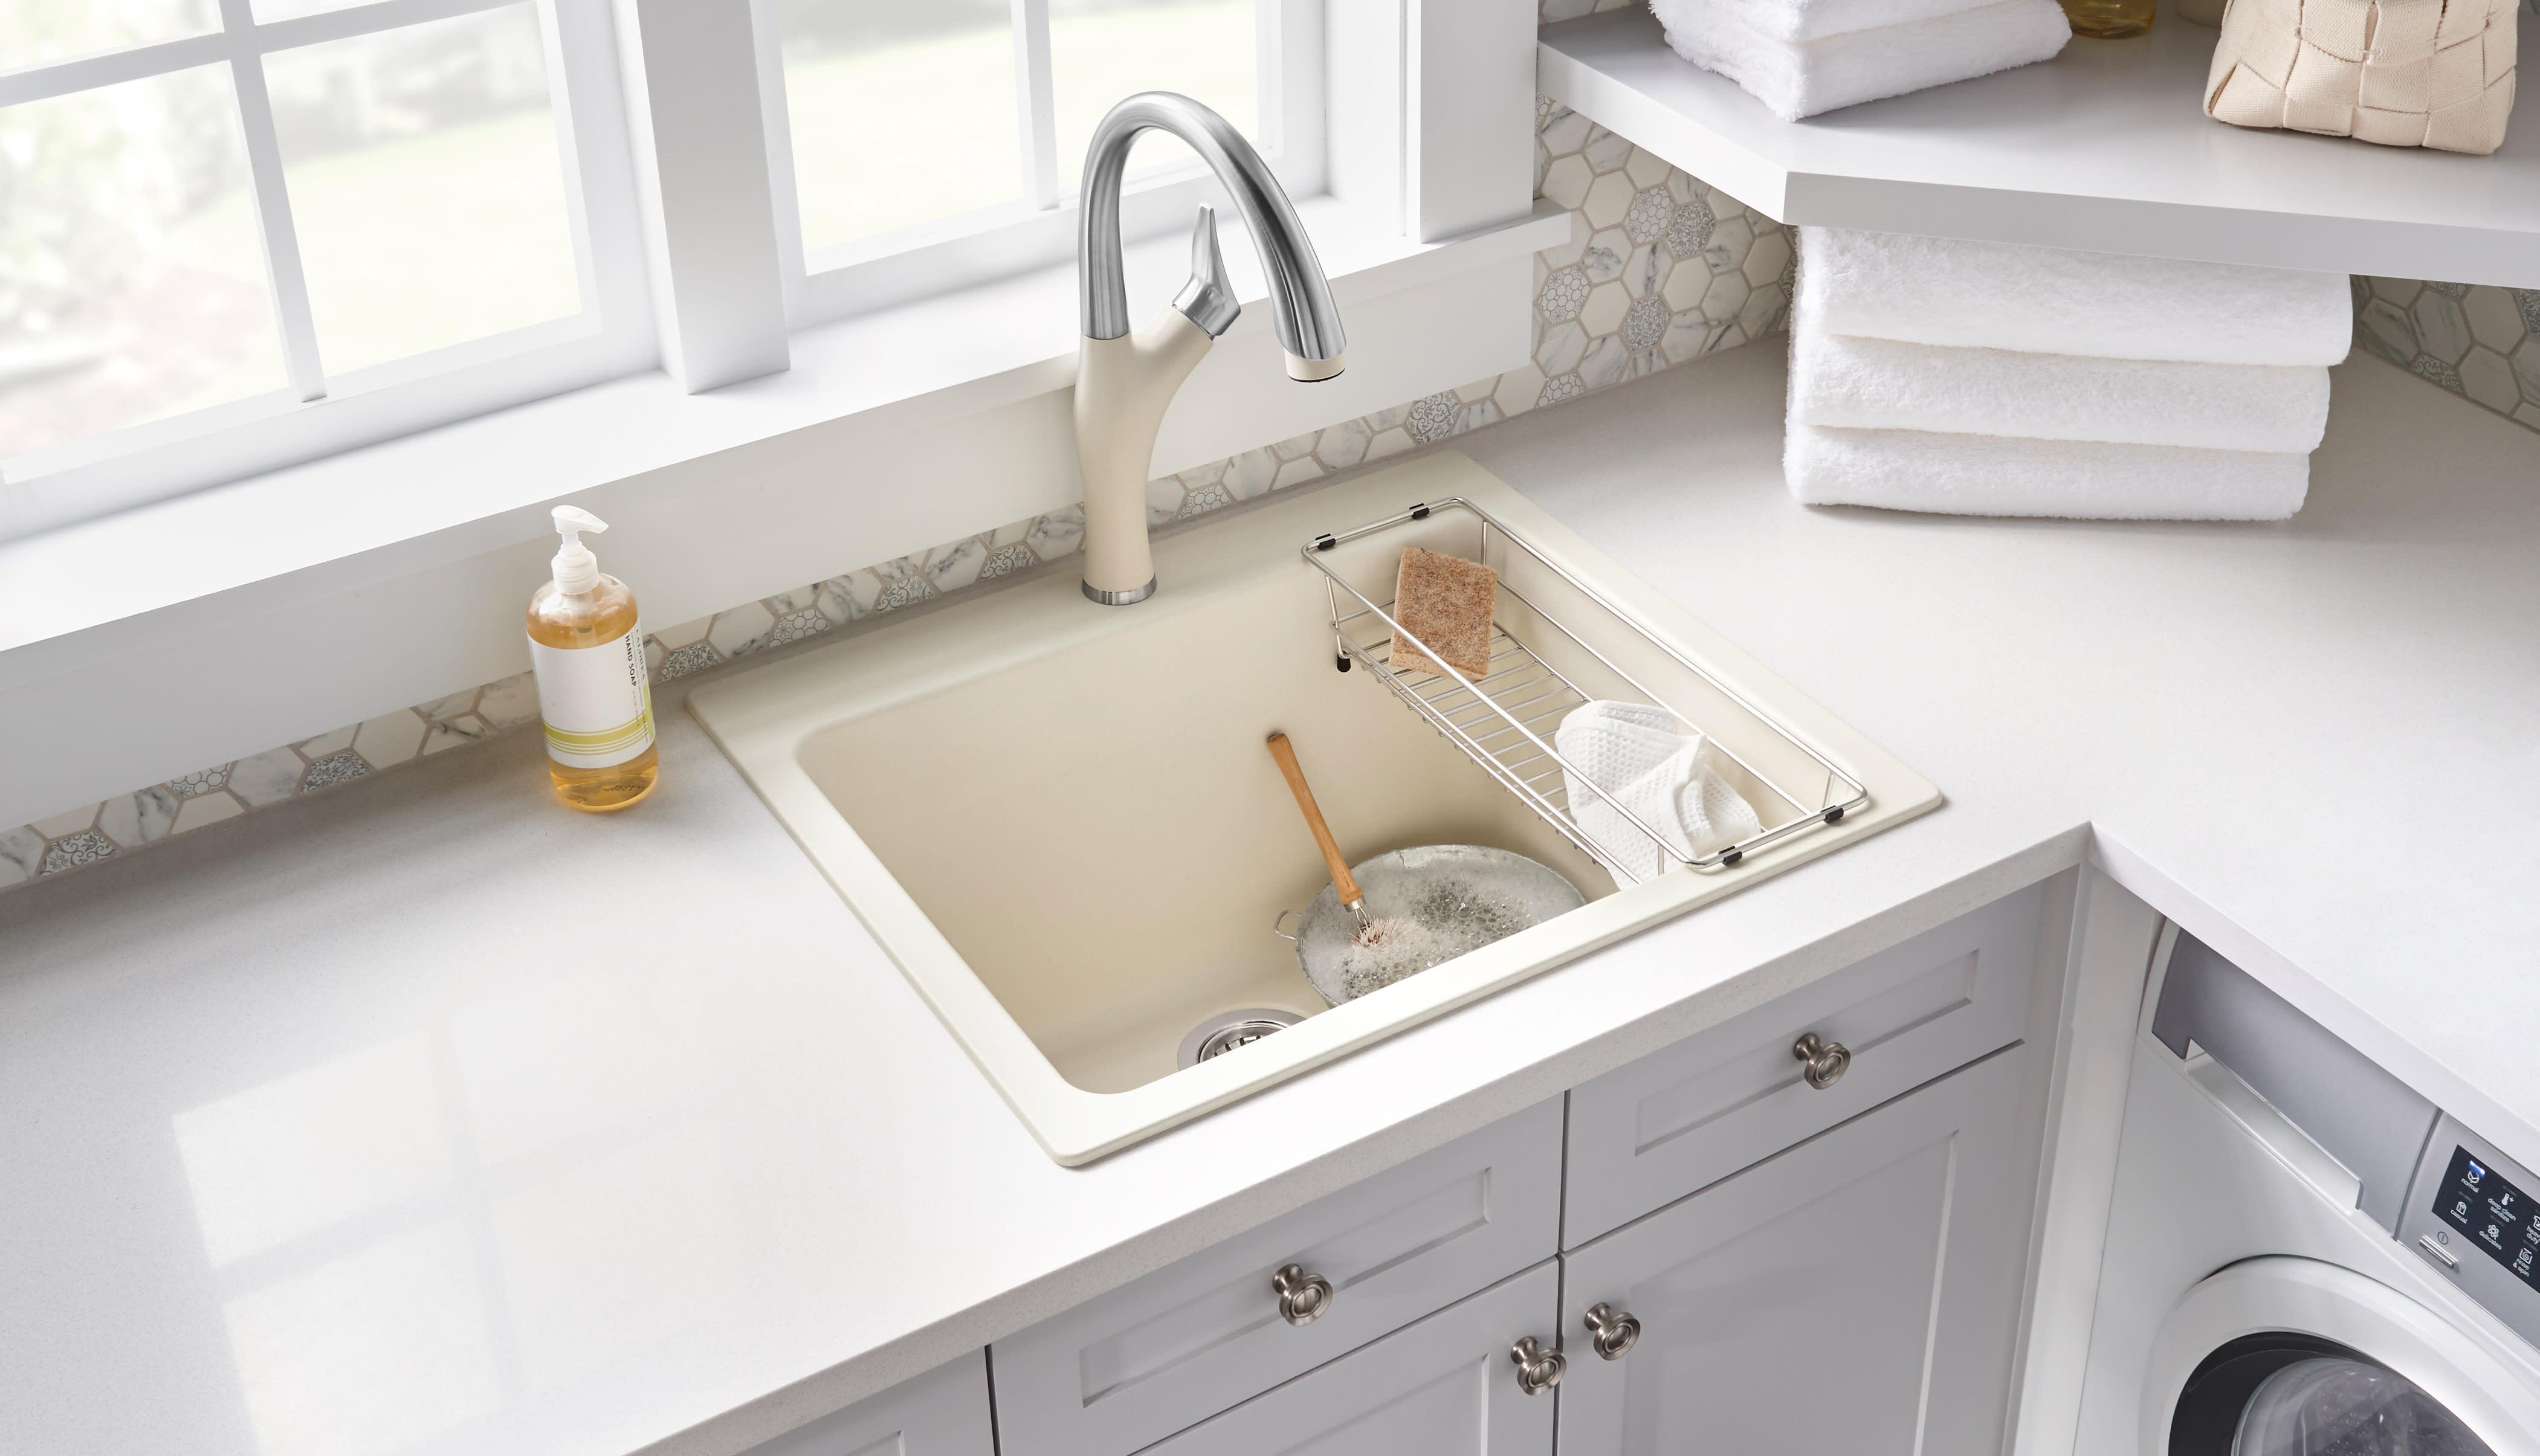 Blanco 442030 Artona Kitchen Faucet 2 2 Gpm Qualitybath Com